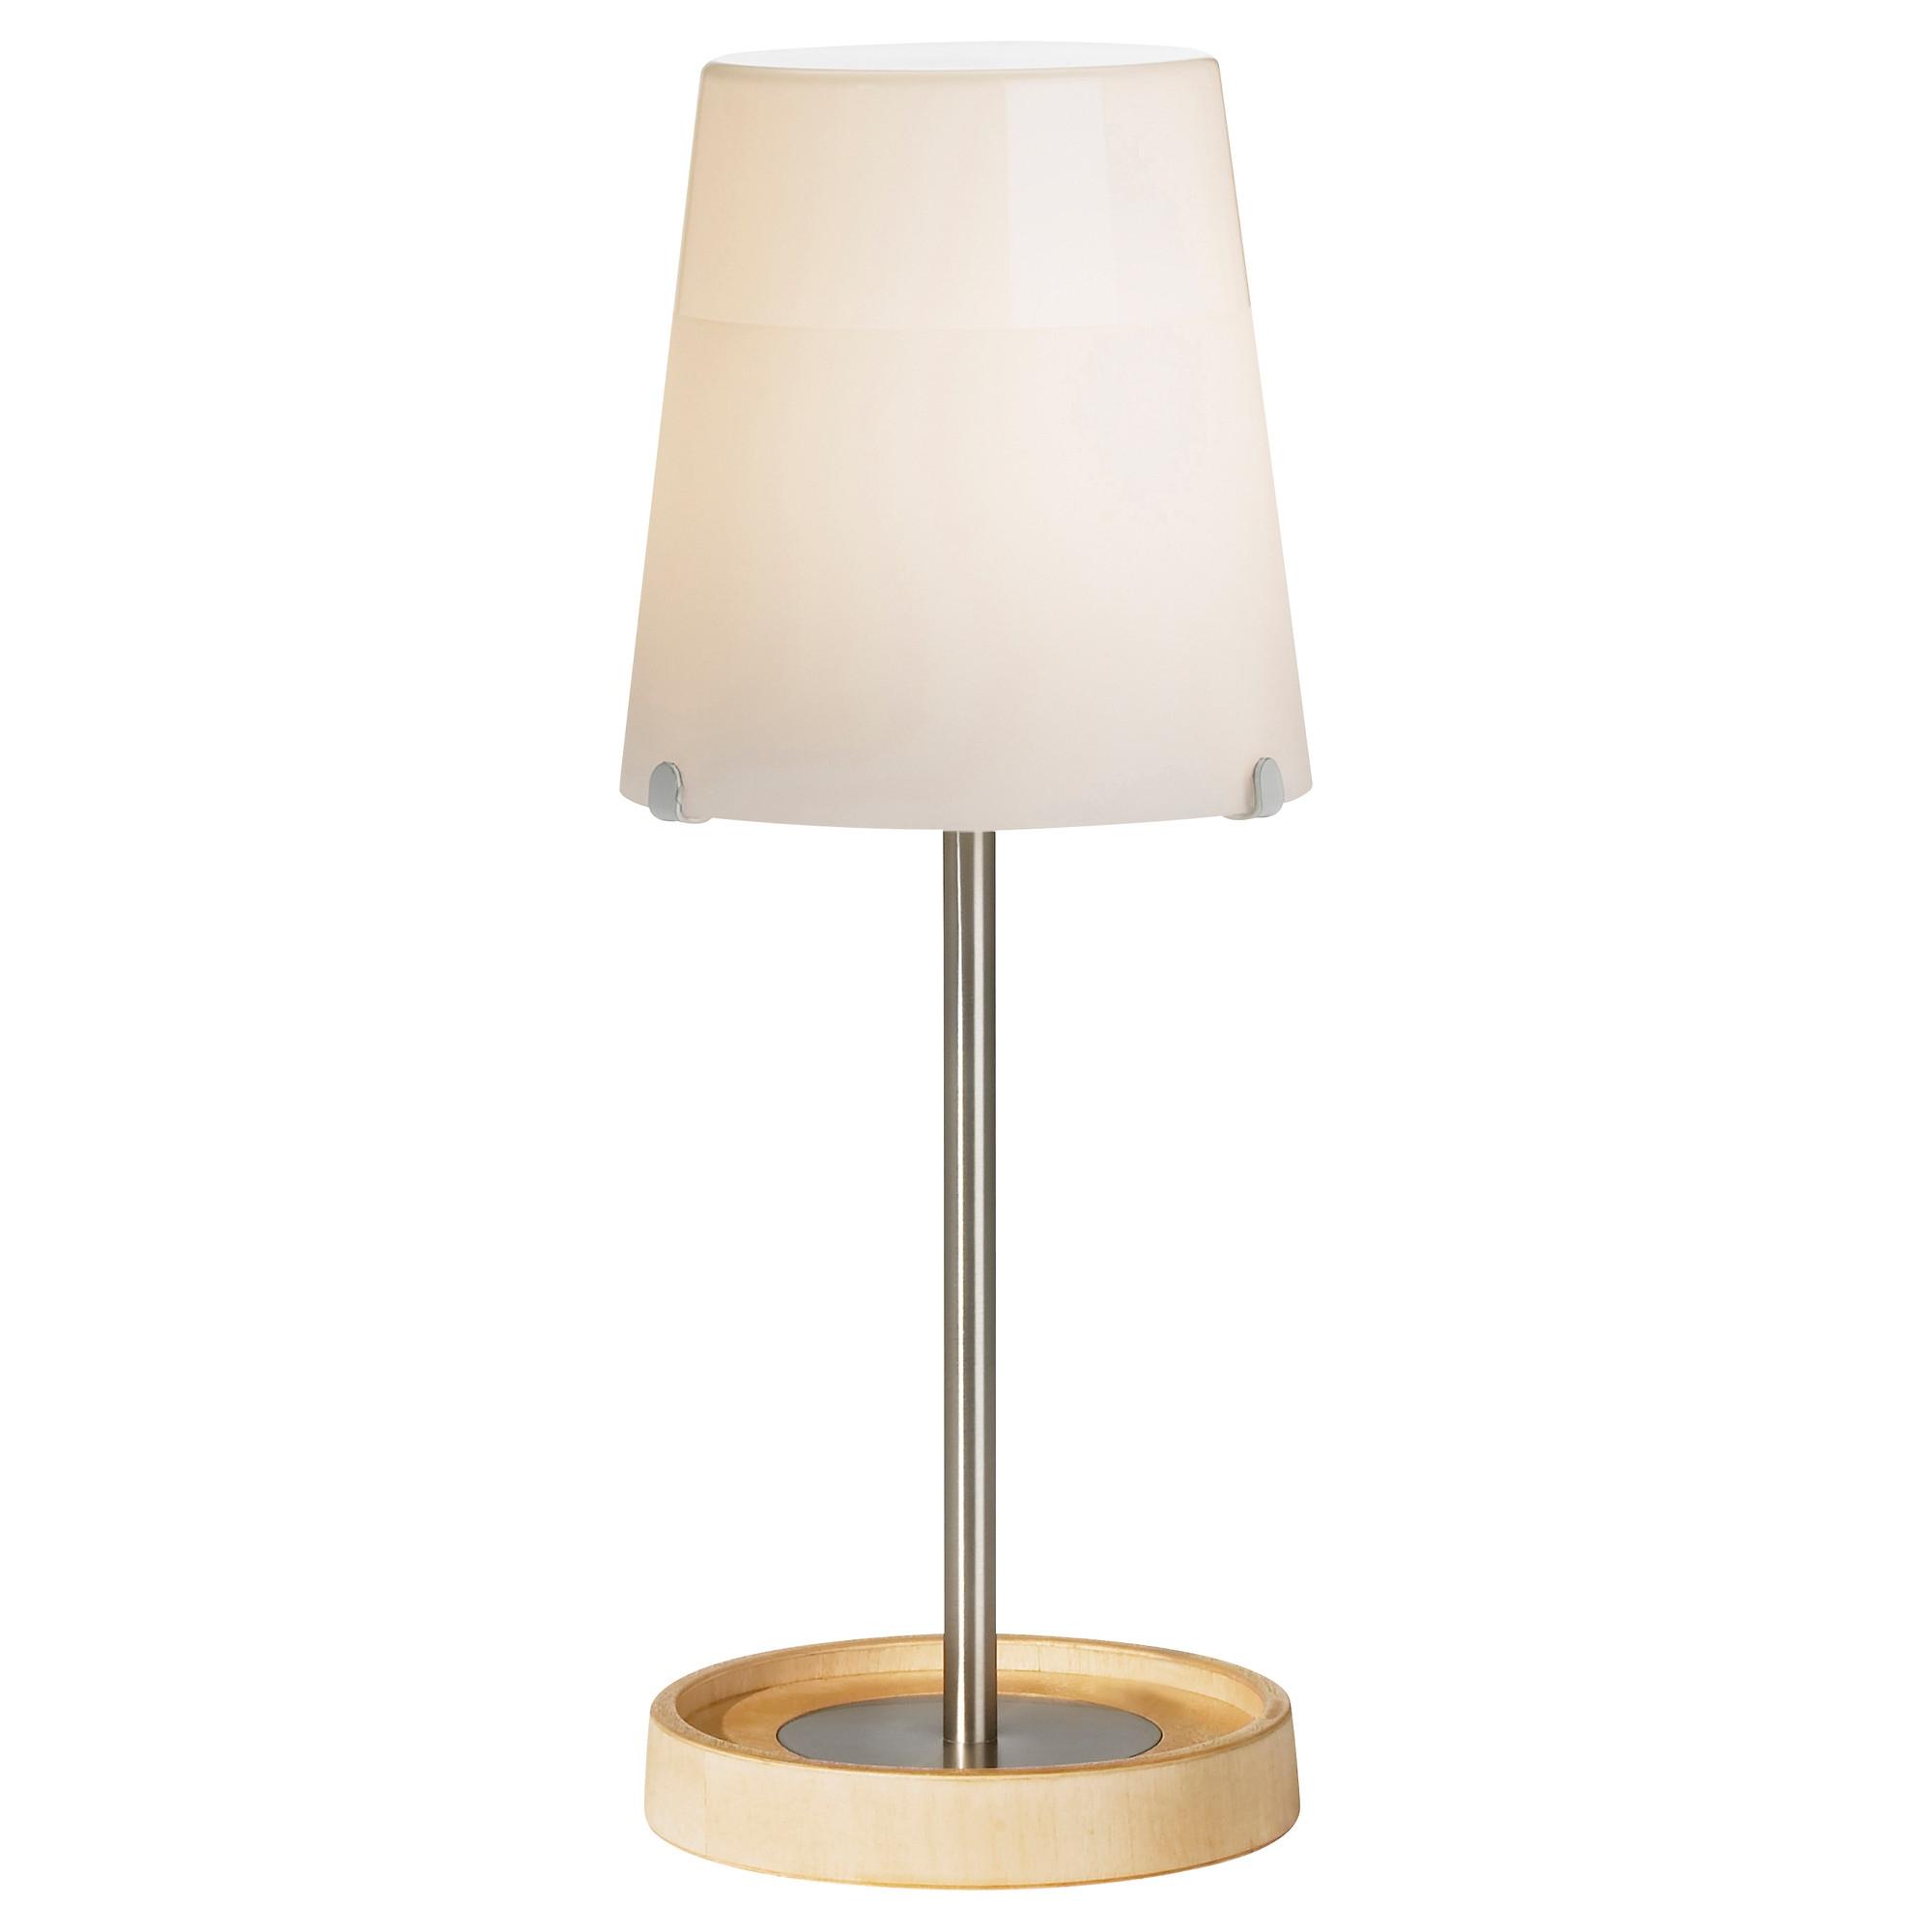 Ikea mallorca detalles producto - Ikea iluminacion ninos ...